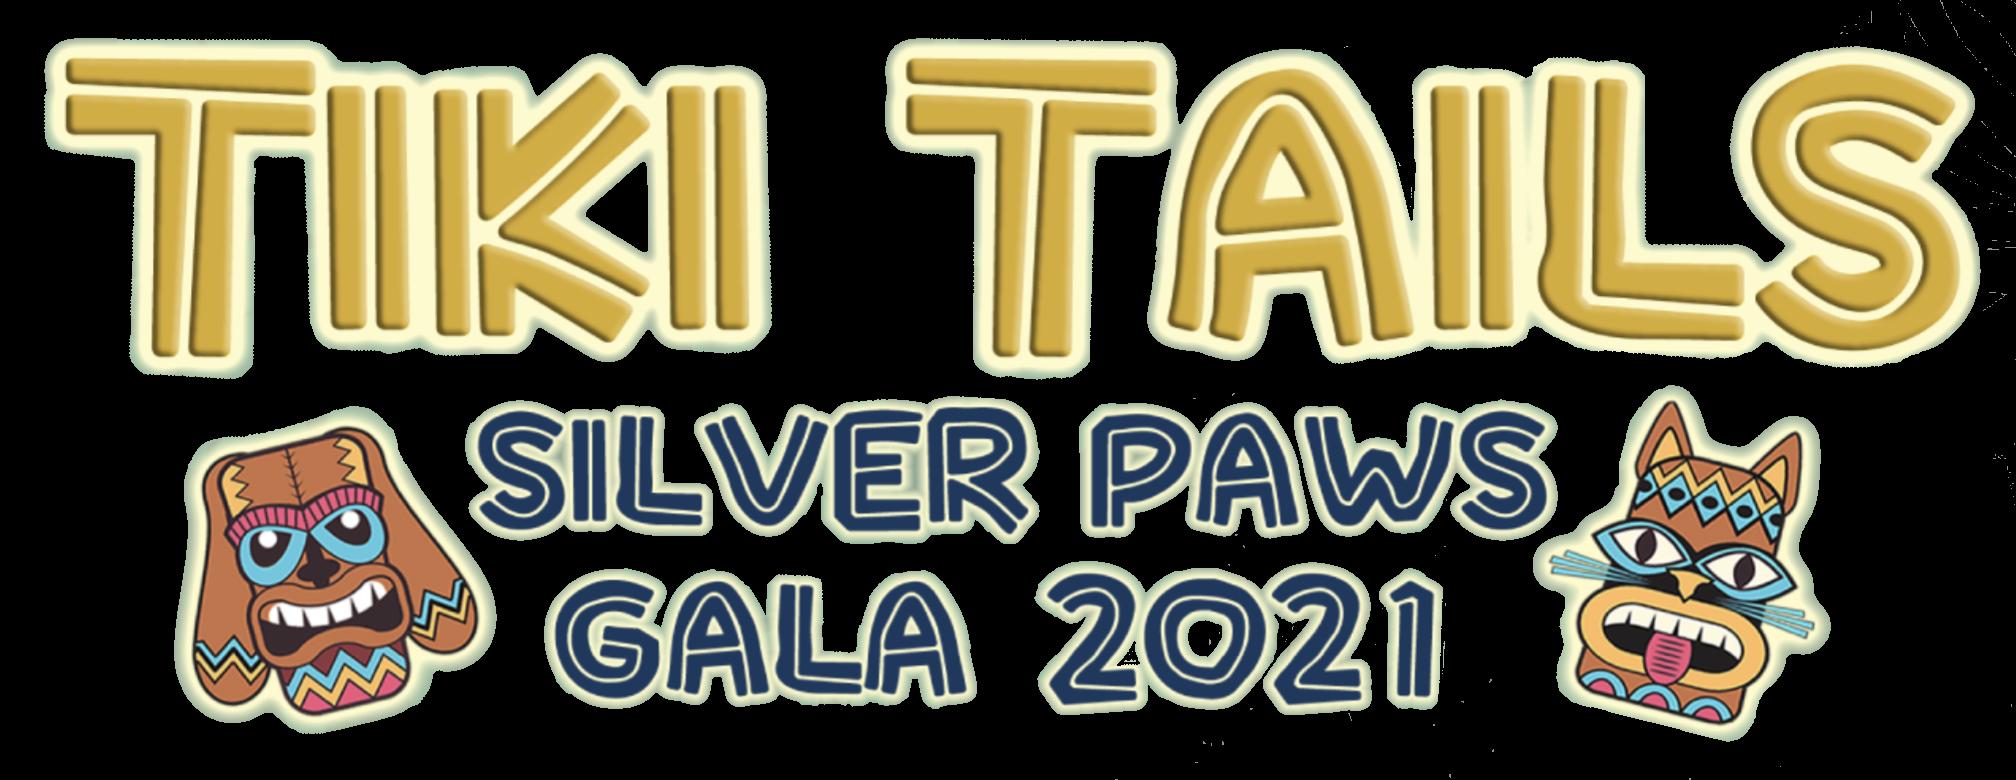 tiki tails logo